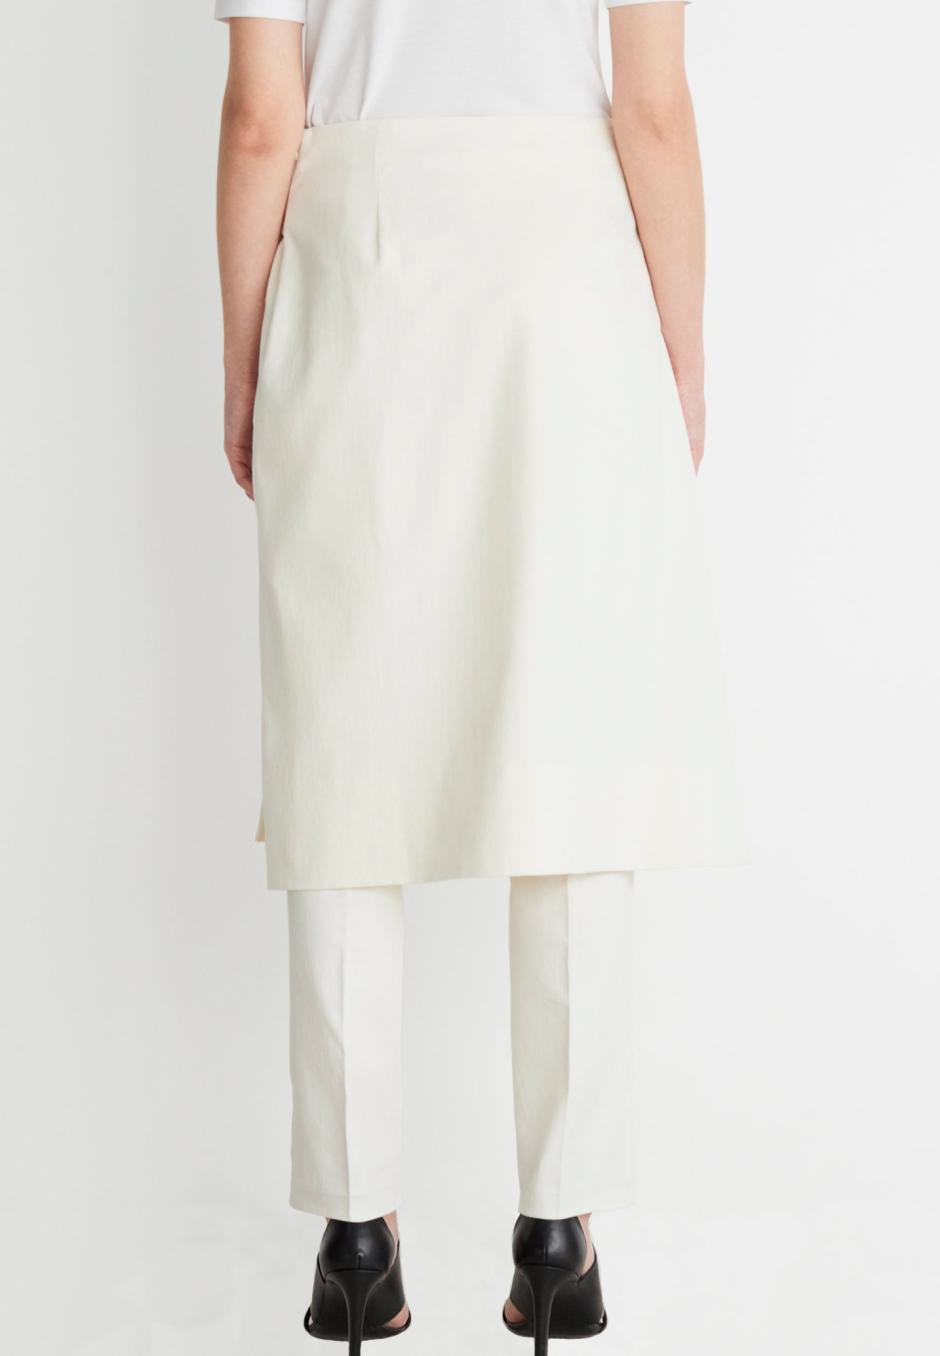 Rodebjer Habiba Skirt